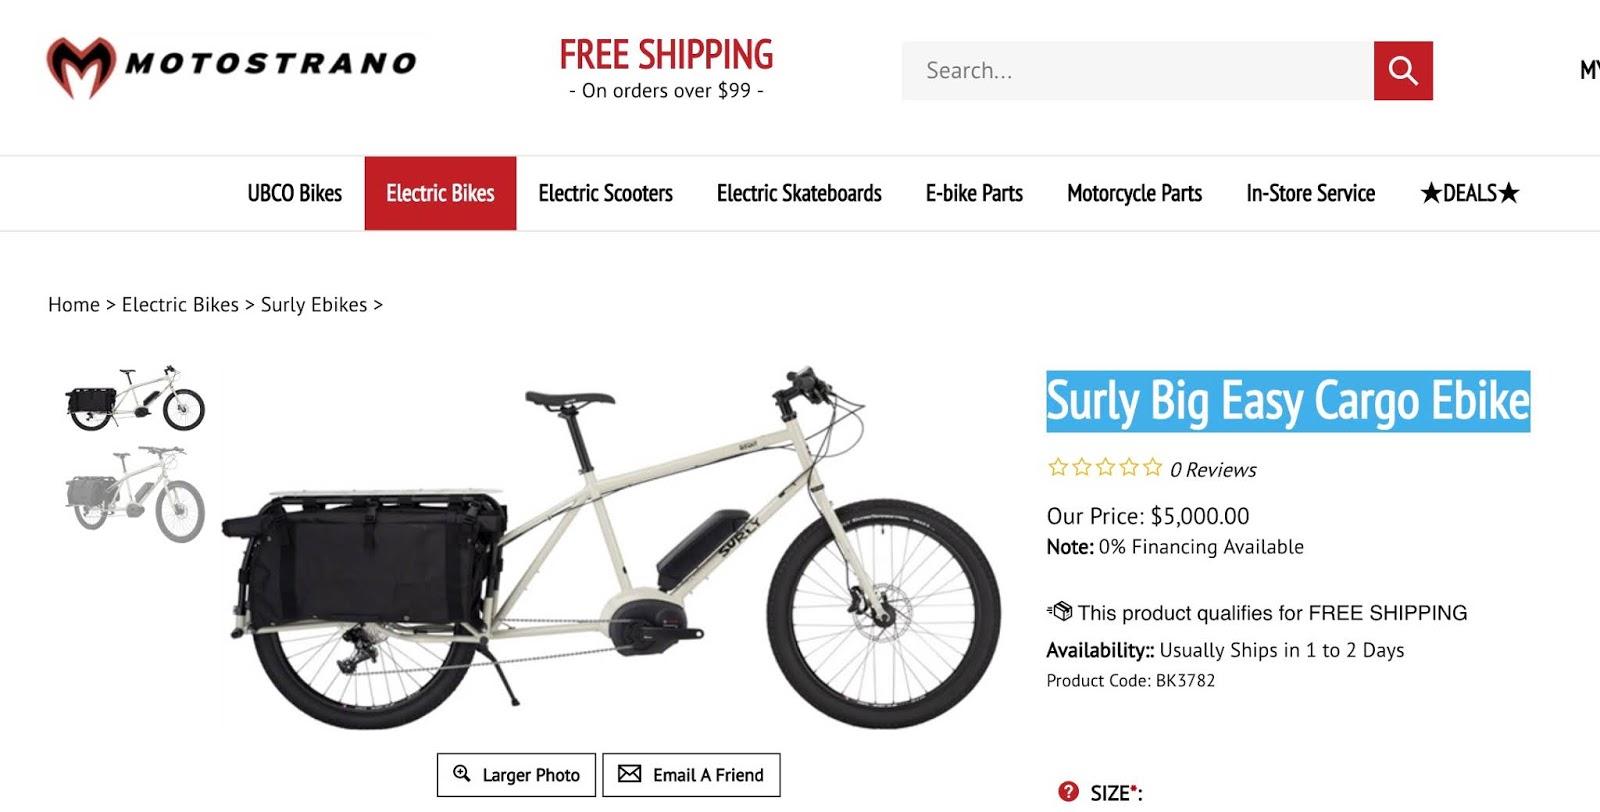 1b8854628df Motostrano Blog - Electric Bike Adventures, Technology, Product News ...